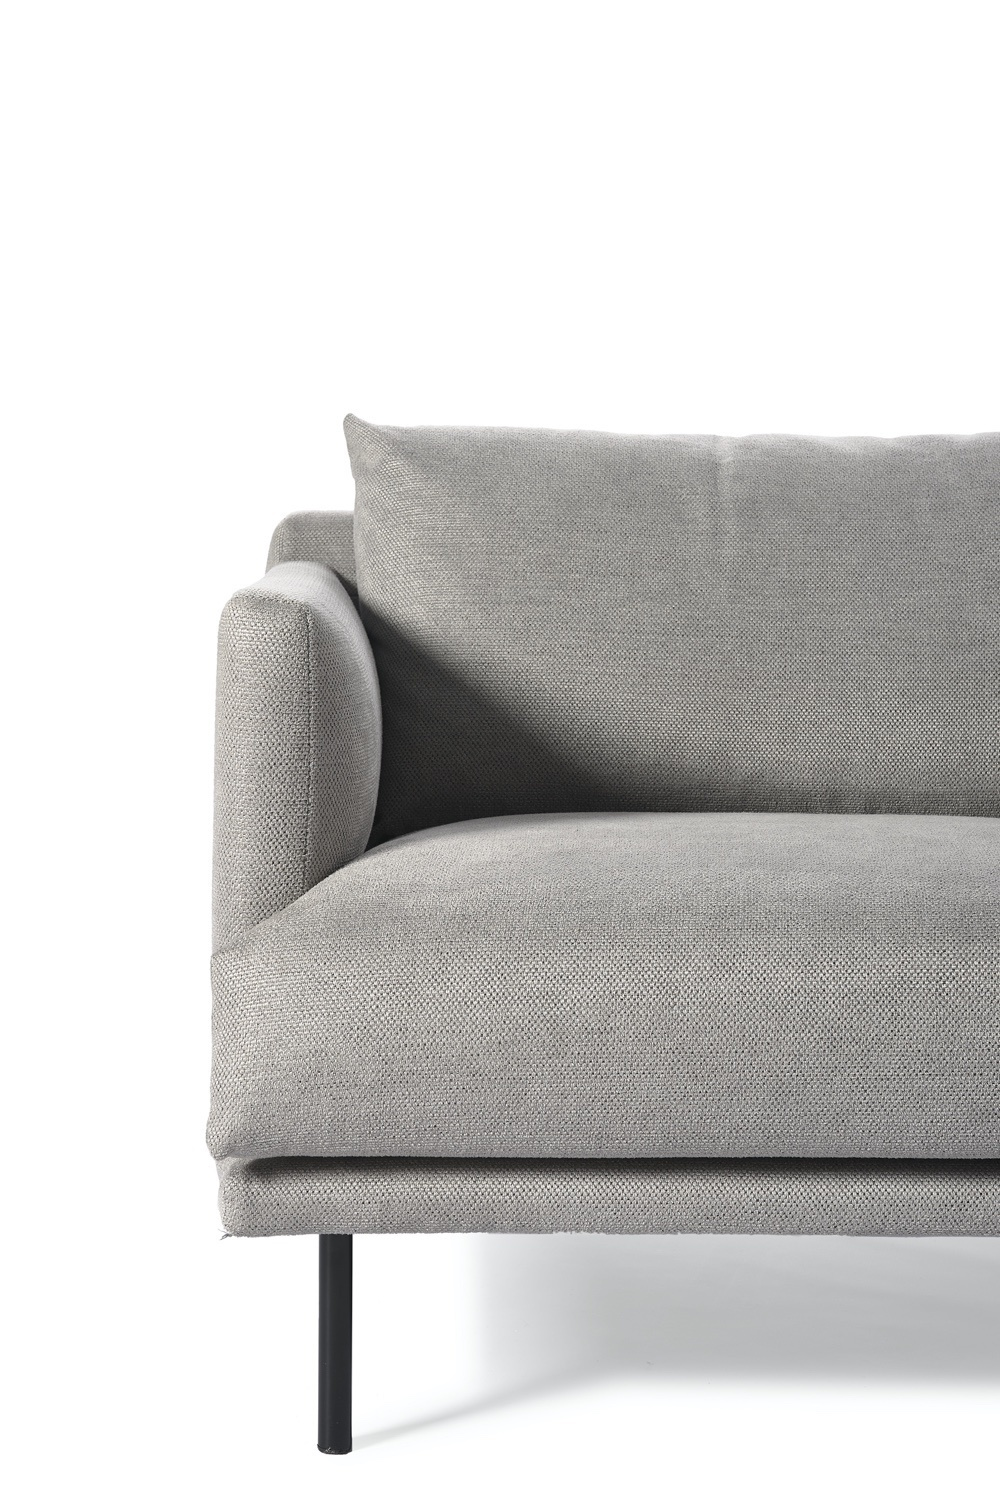 MINIMAL LOFT 1-zits/ fauteuil-3